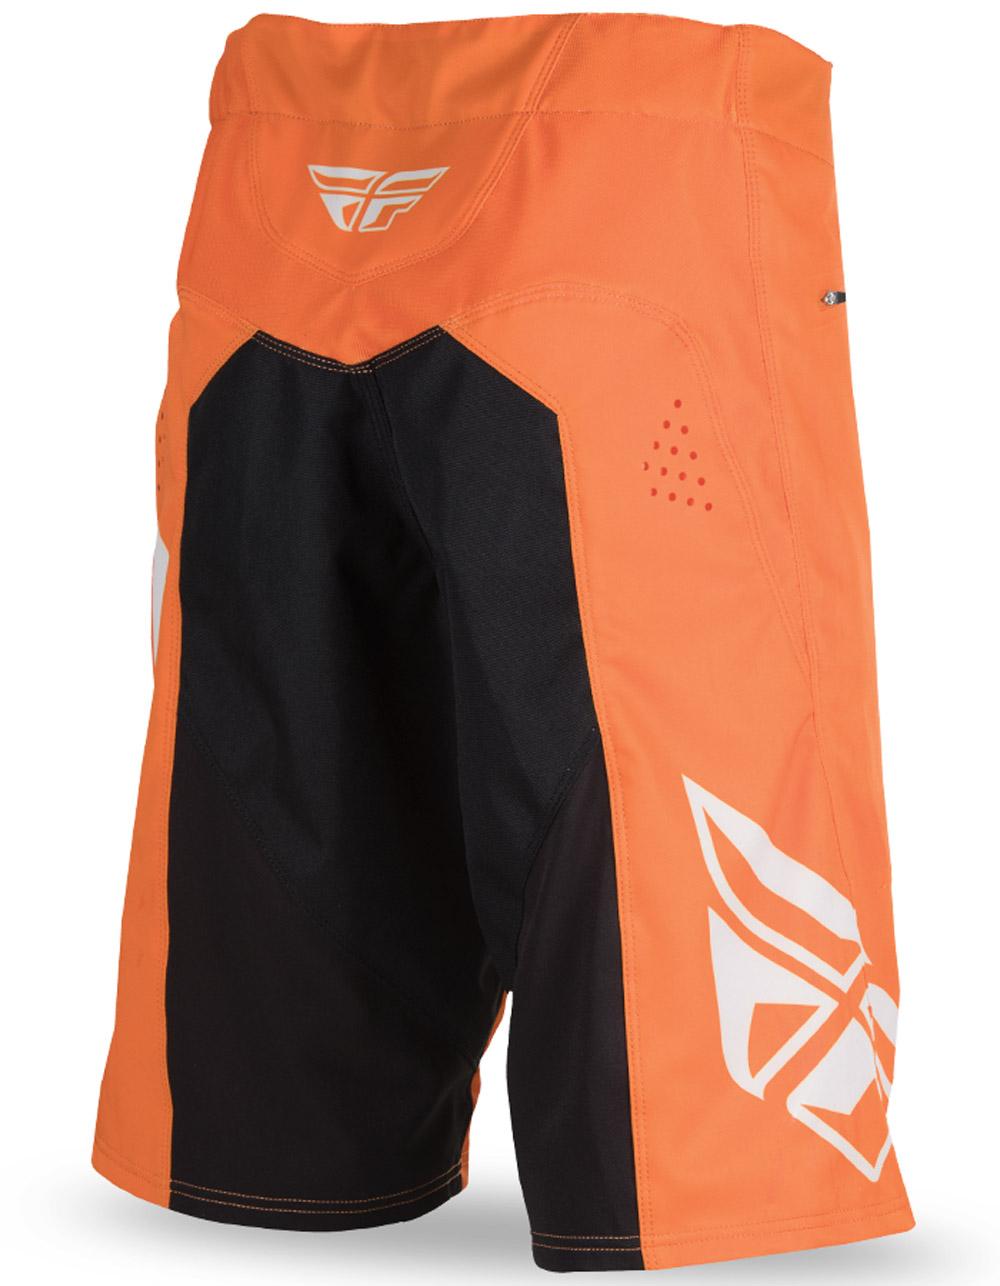 Fly-Racing-2017-Radium-Bike-Shorts-Mens-All-Sizes-amp-Colors thumbnail 7